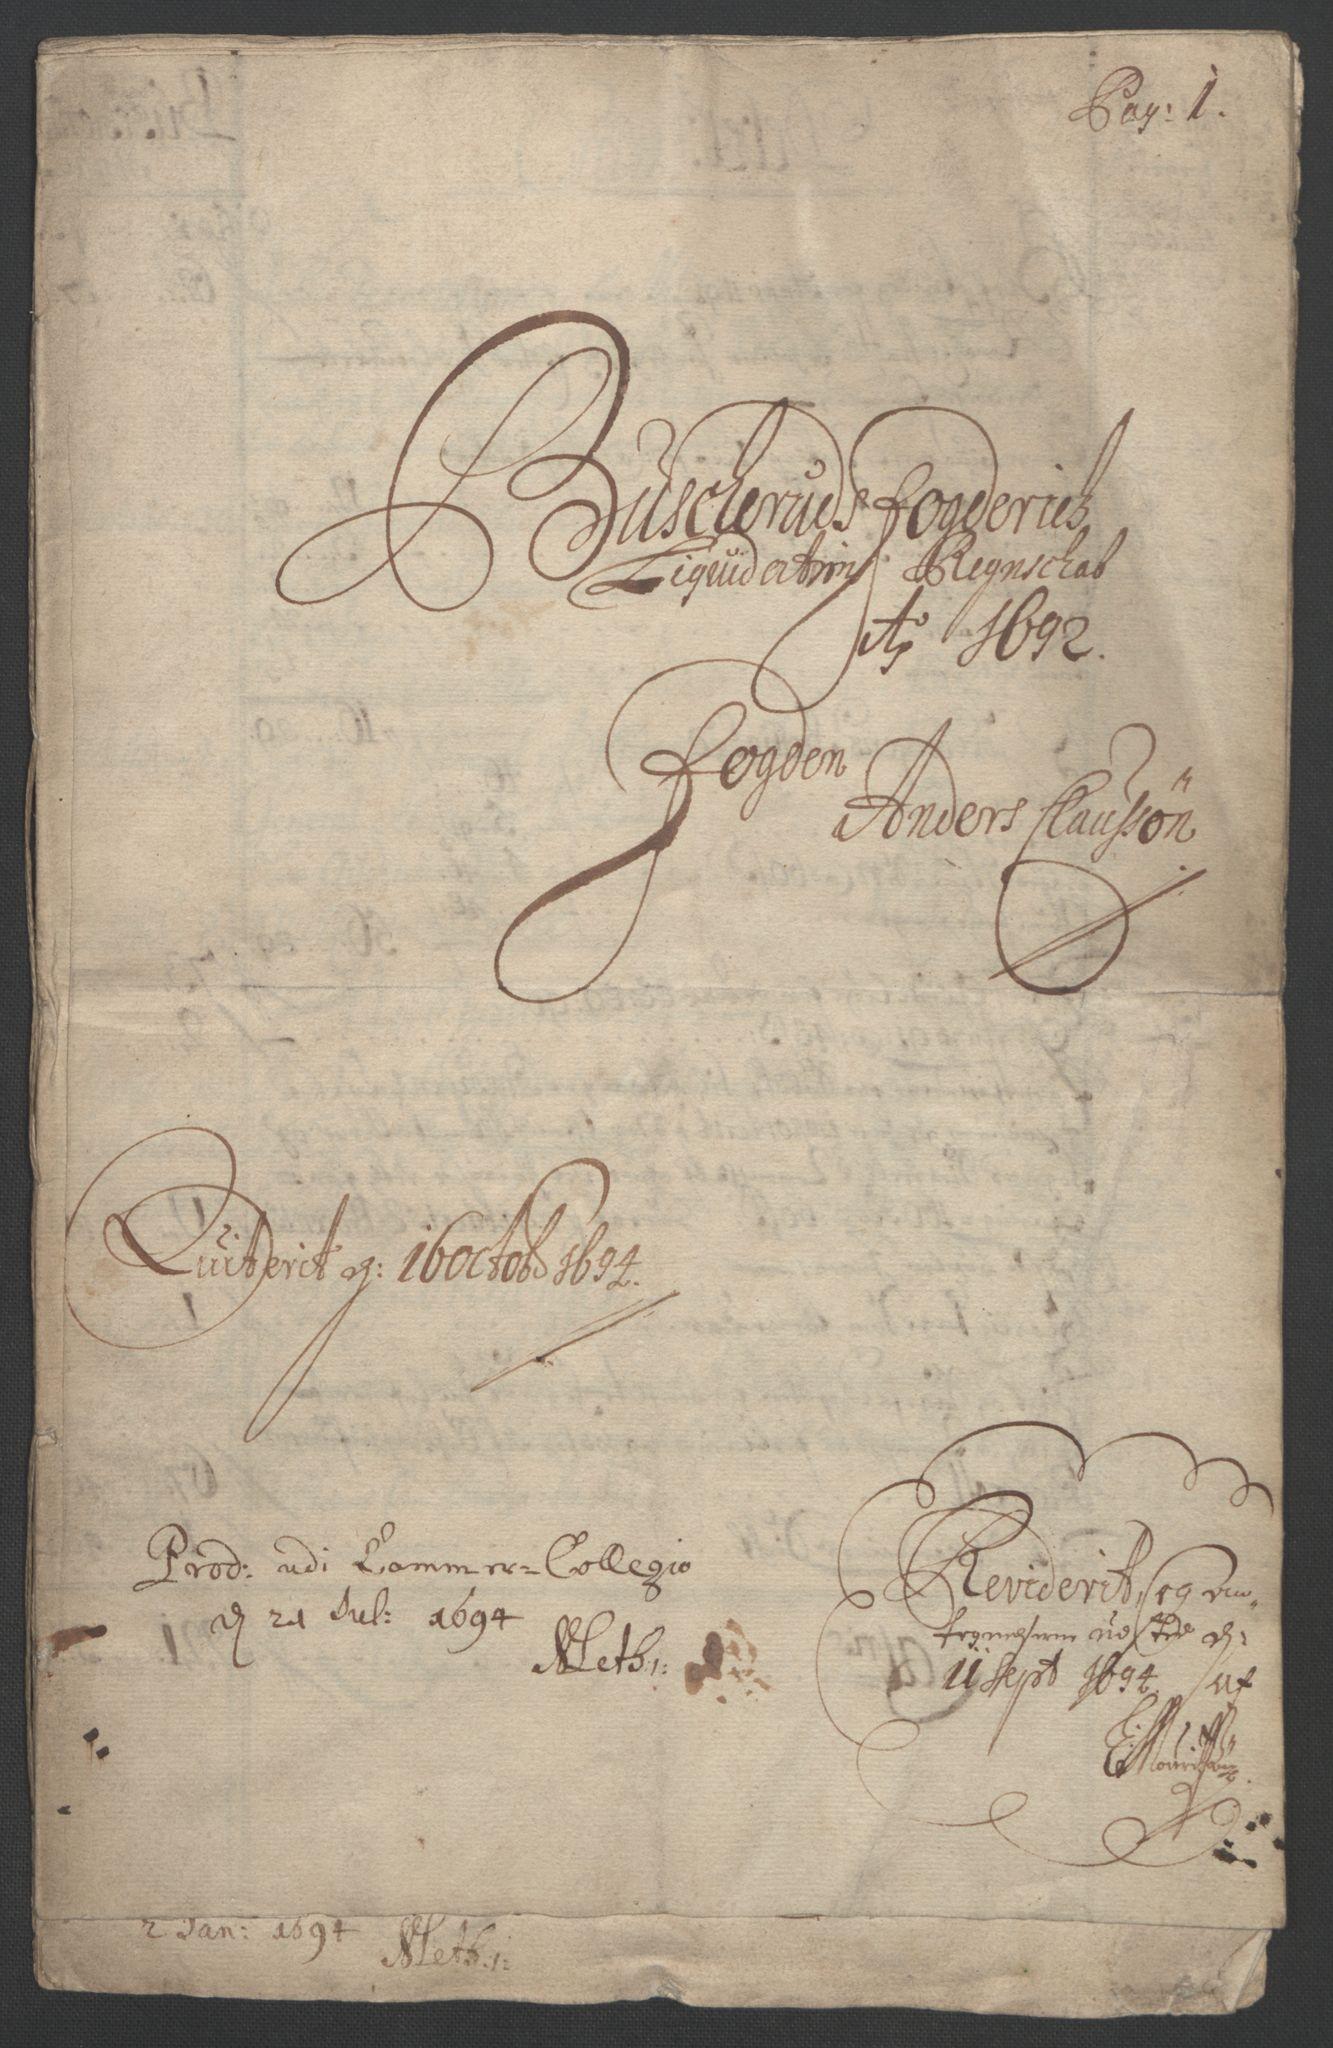 RA, Rentekammeret inntil 1814, Reviderte regnskaper, Fogderegnskap, R25/L1681: Fogderegnskap Buskerud, 1691-1692, s. 306